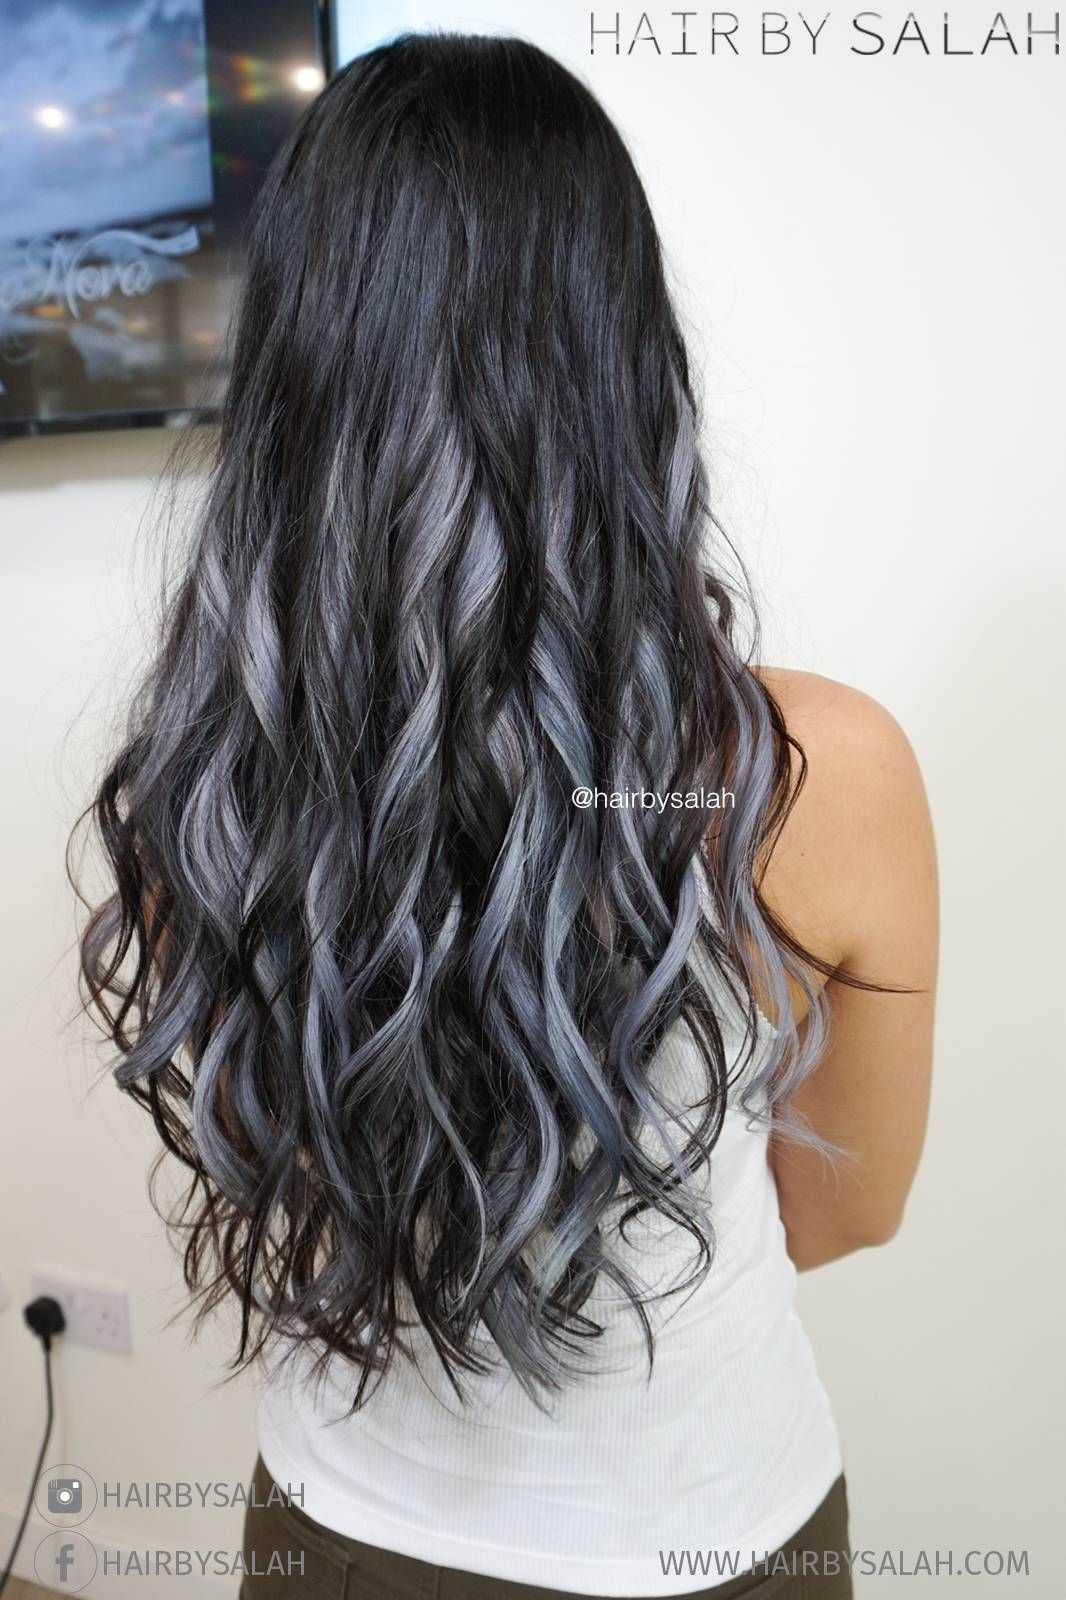 Image Result For Silver Highlights On Dark Brown Hair Dark Hair Grey Highlights Brown Hair With Silver Highlights Hair Highlights